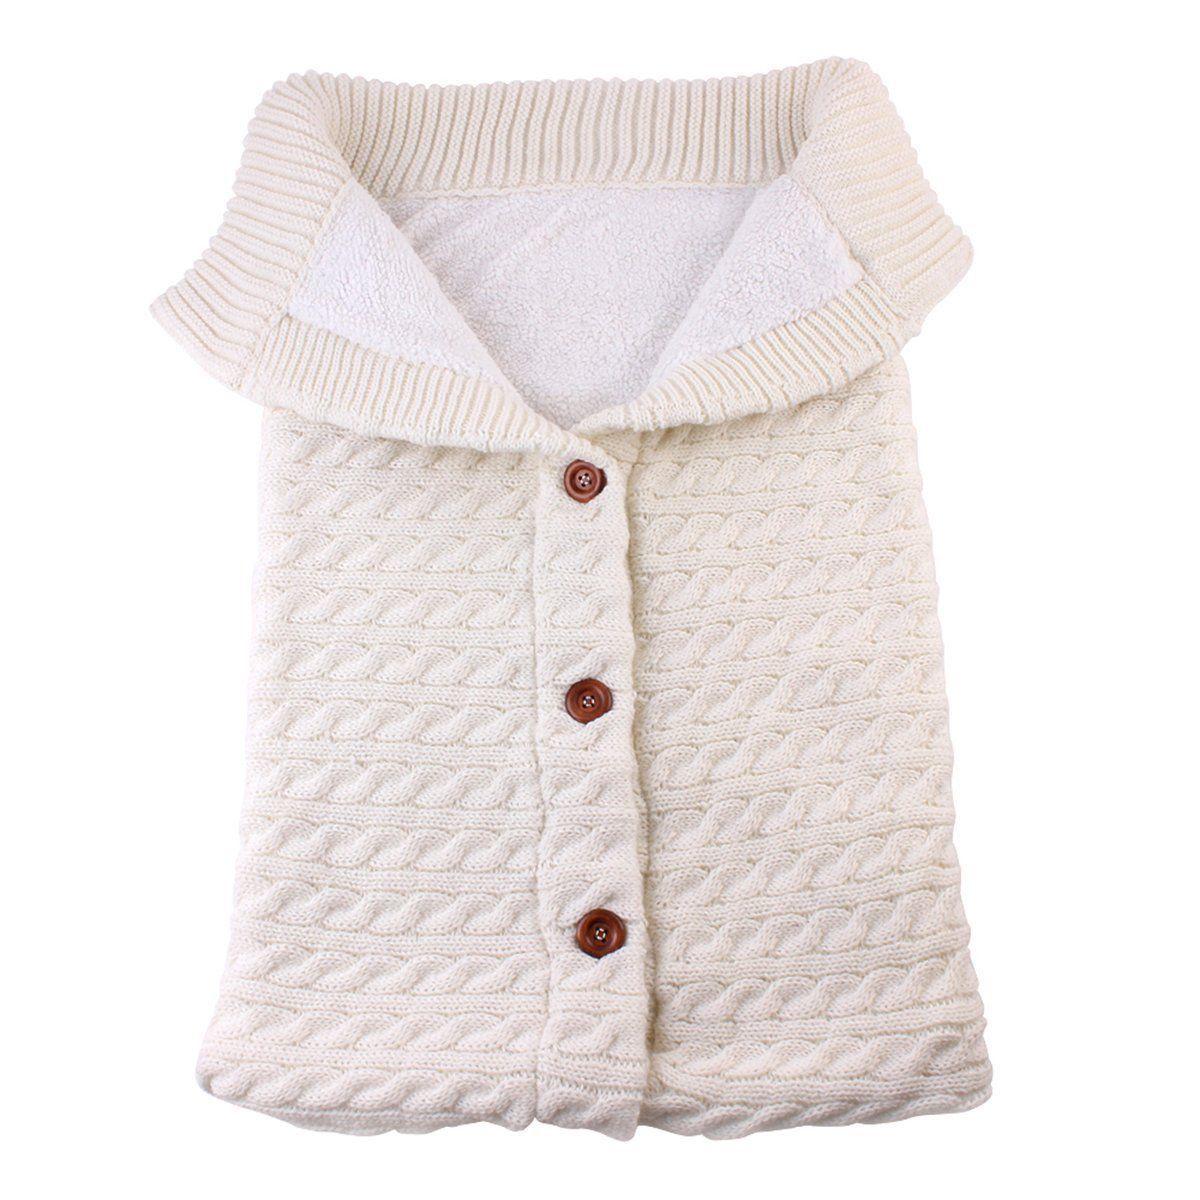 Newborn Baby Winter Warm Sleeping Bags Infant Button Knit Swaddle Wrap Swaddling Stroller Wrap Toddler Blanket Sleeping Bags 4